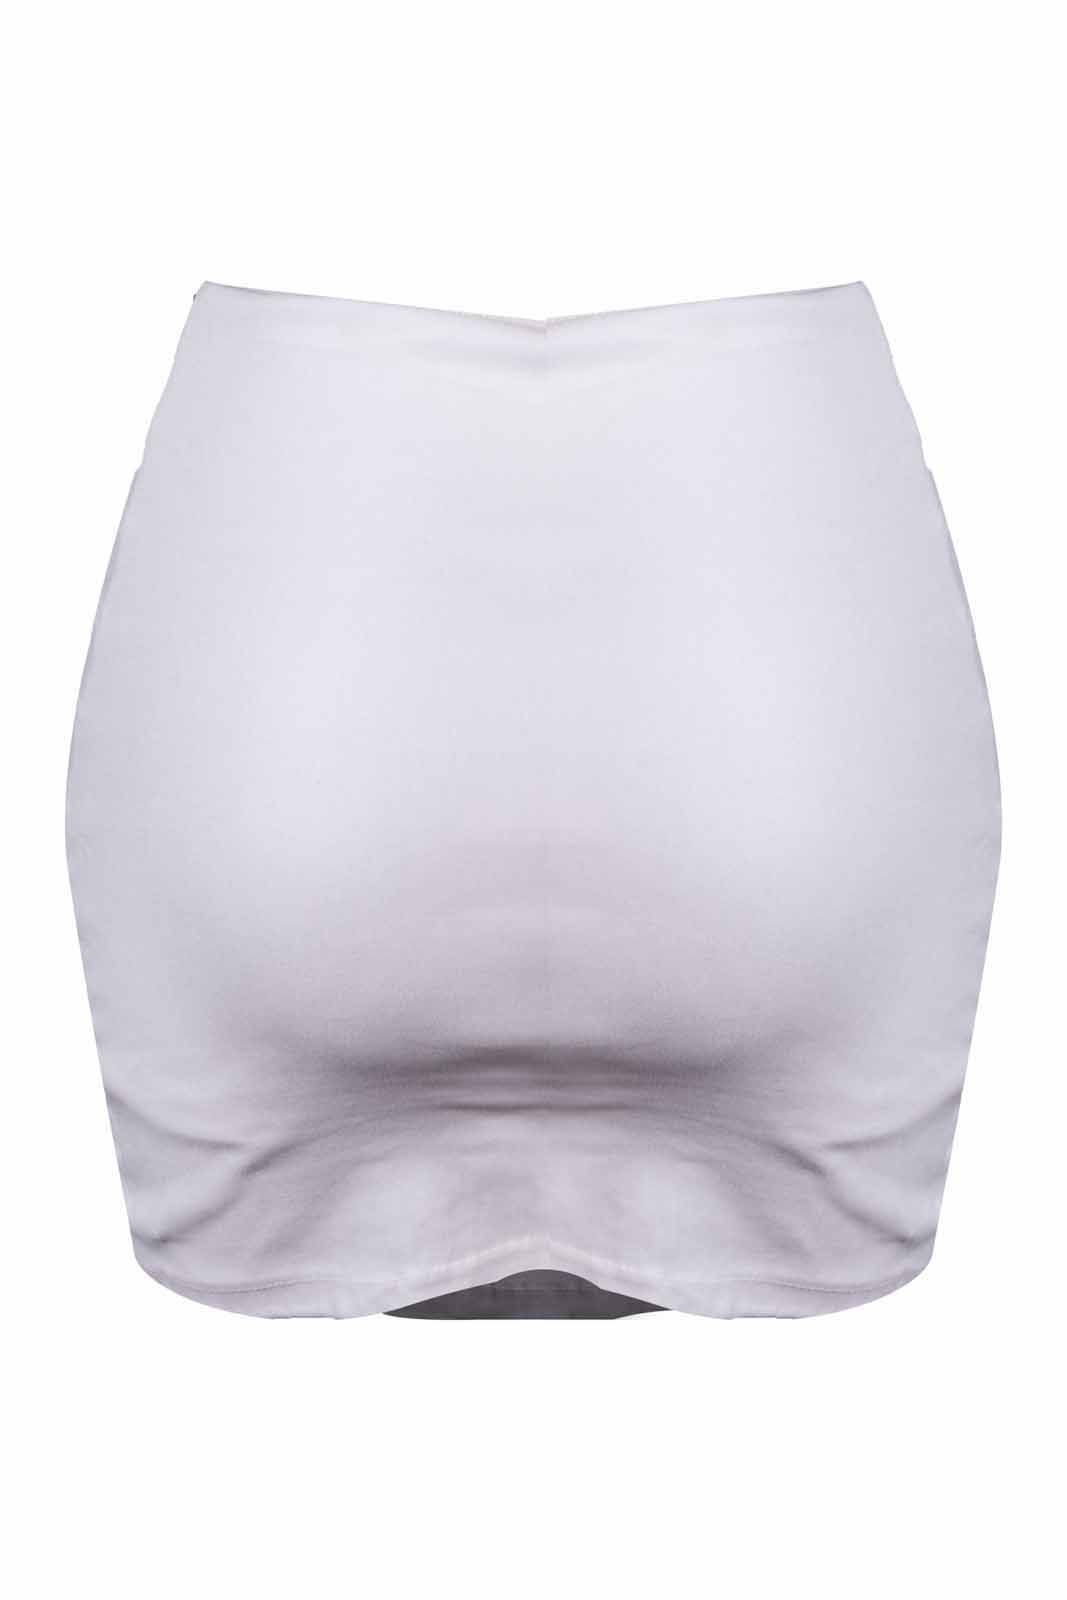 Shorts Saia OutletDri Bengaline Curta Justa Detalhe Drappeado Frontal Branco